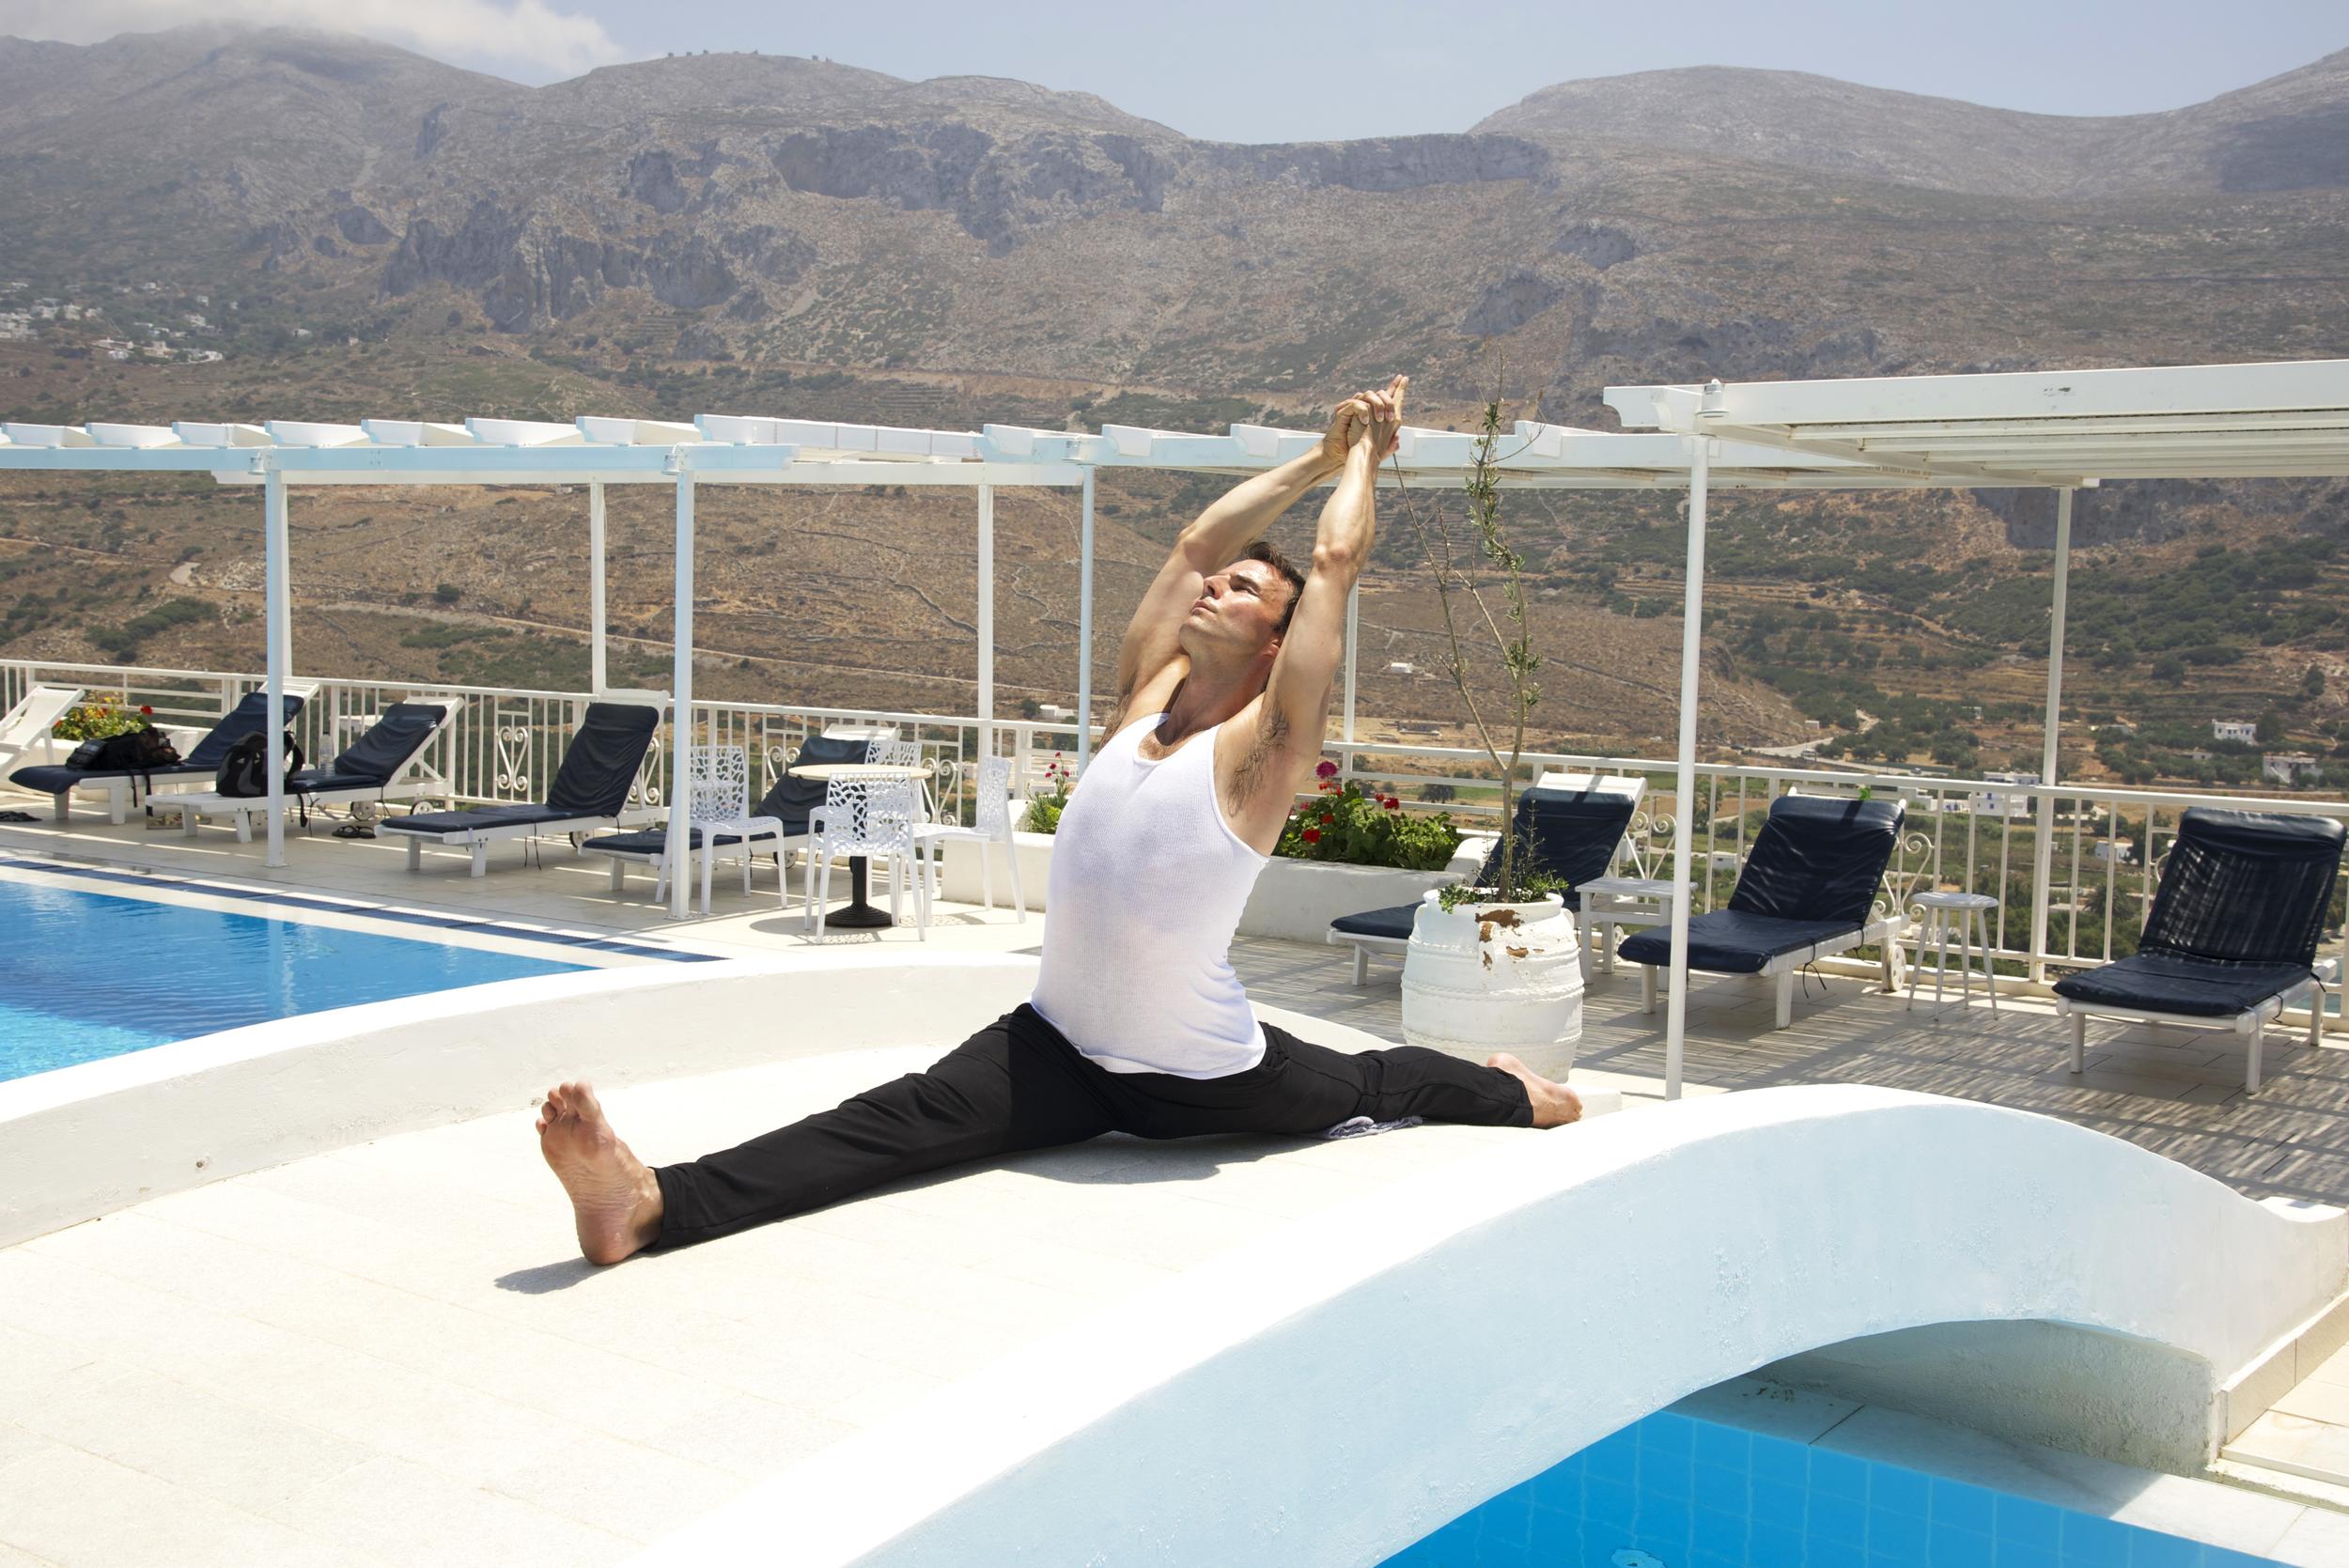 Garth - Greece - Hanumanasana - Pool.jpg